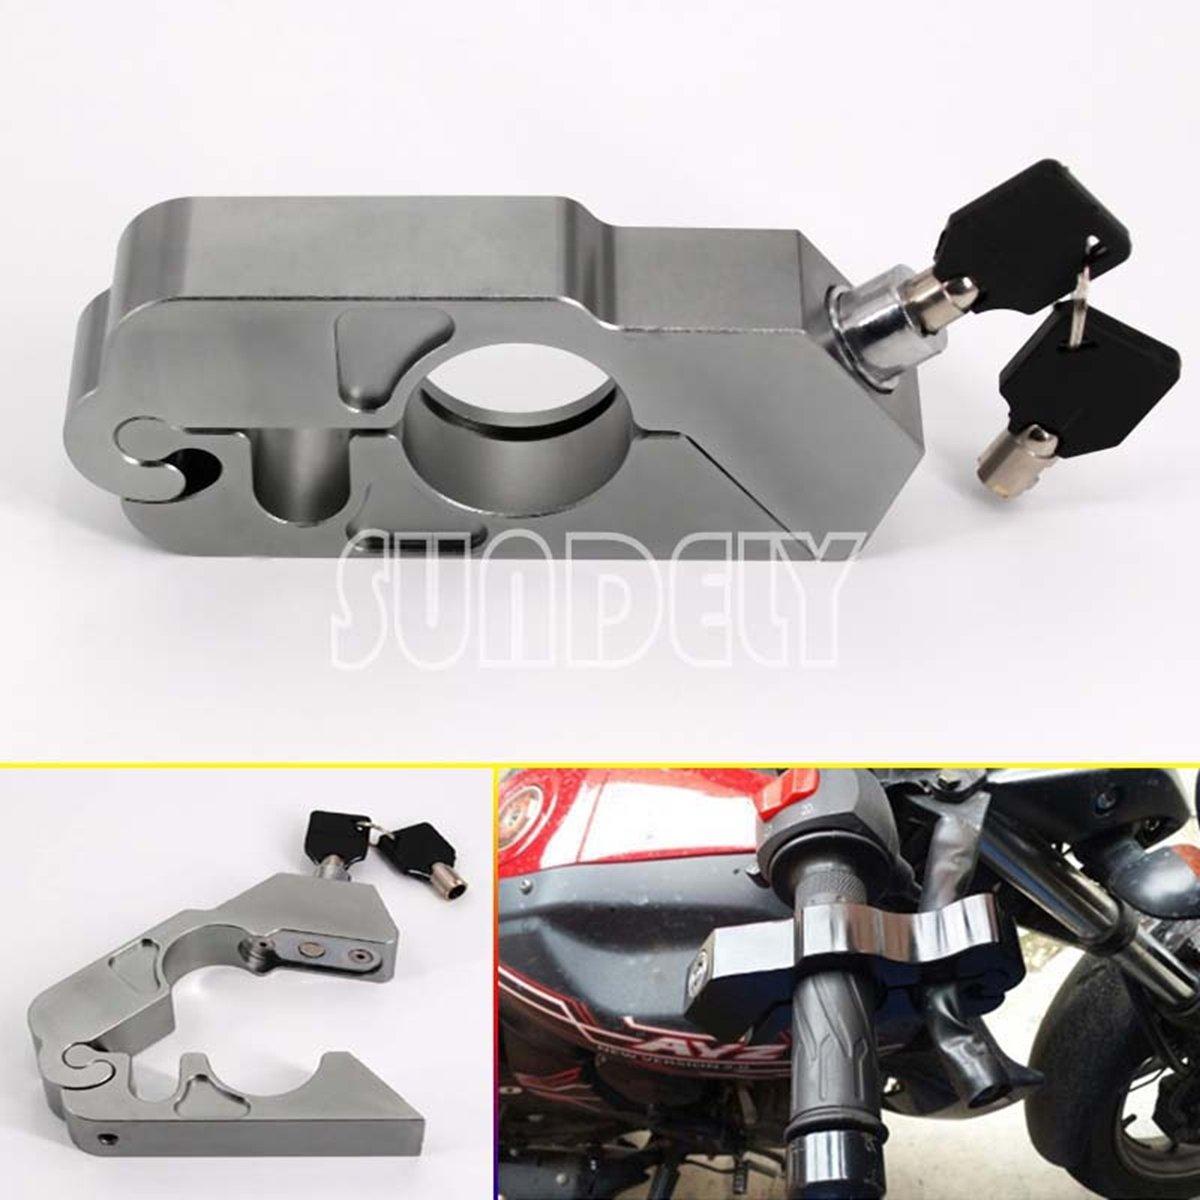 SUNDELY Custom Motorcycle Handlebar Grip Brake Lever Security Caps-Lock Anit Theft Gray 460244